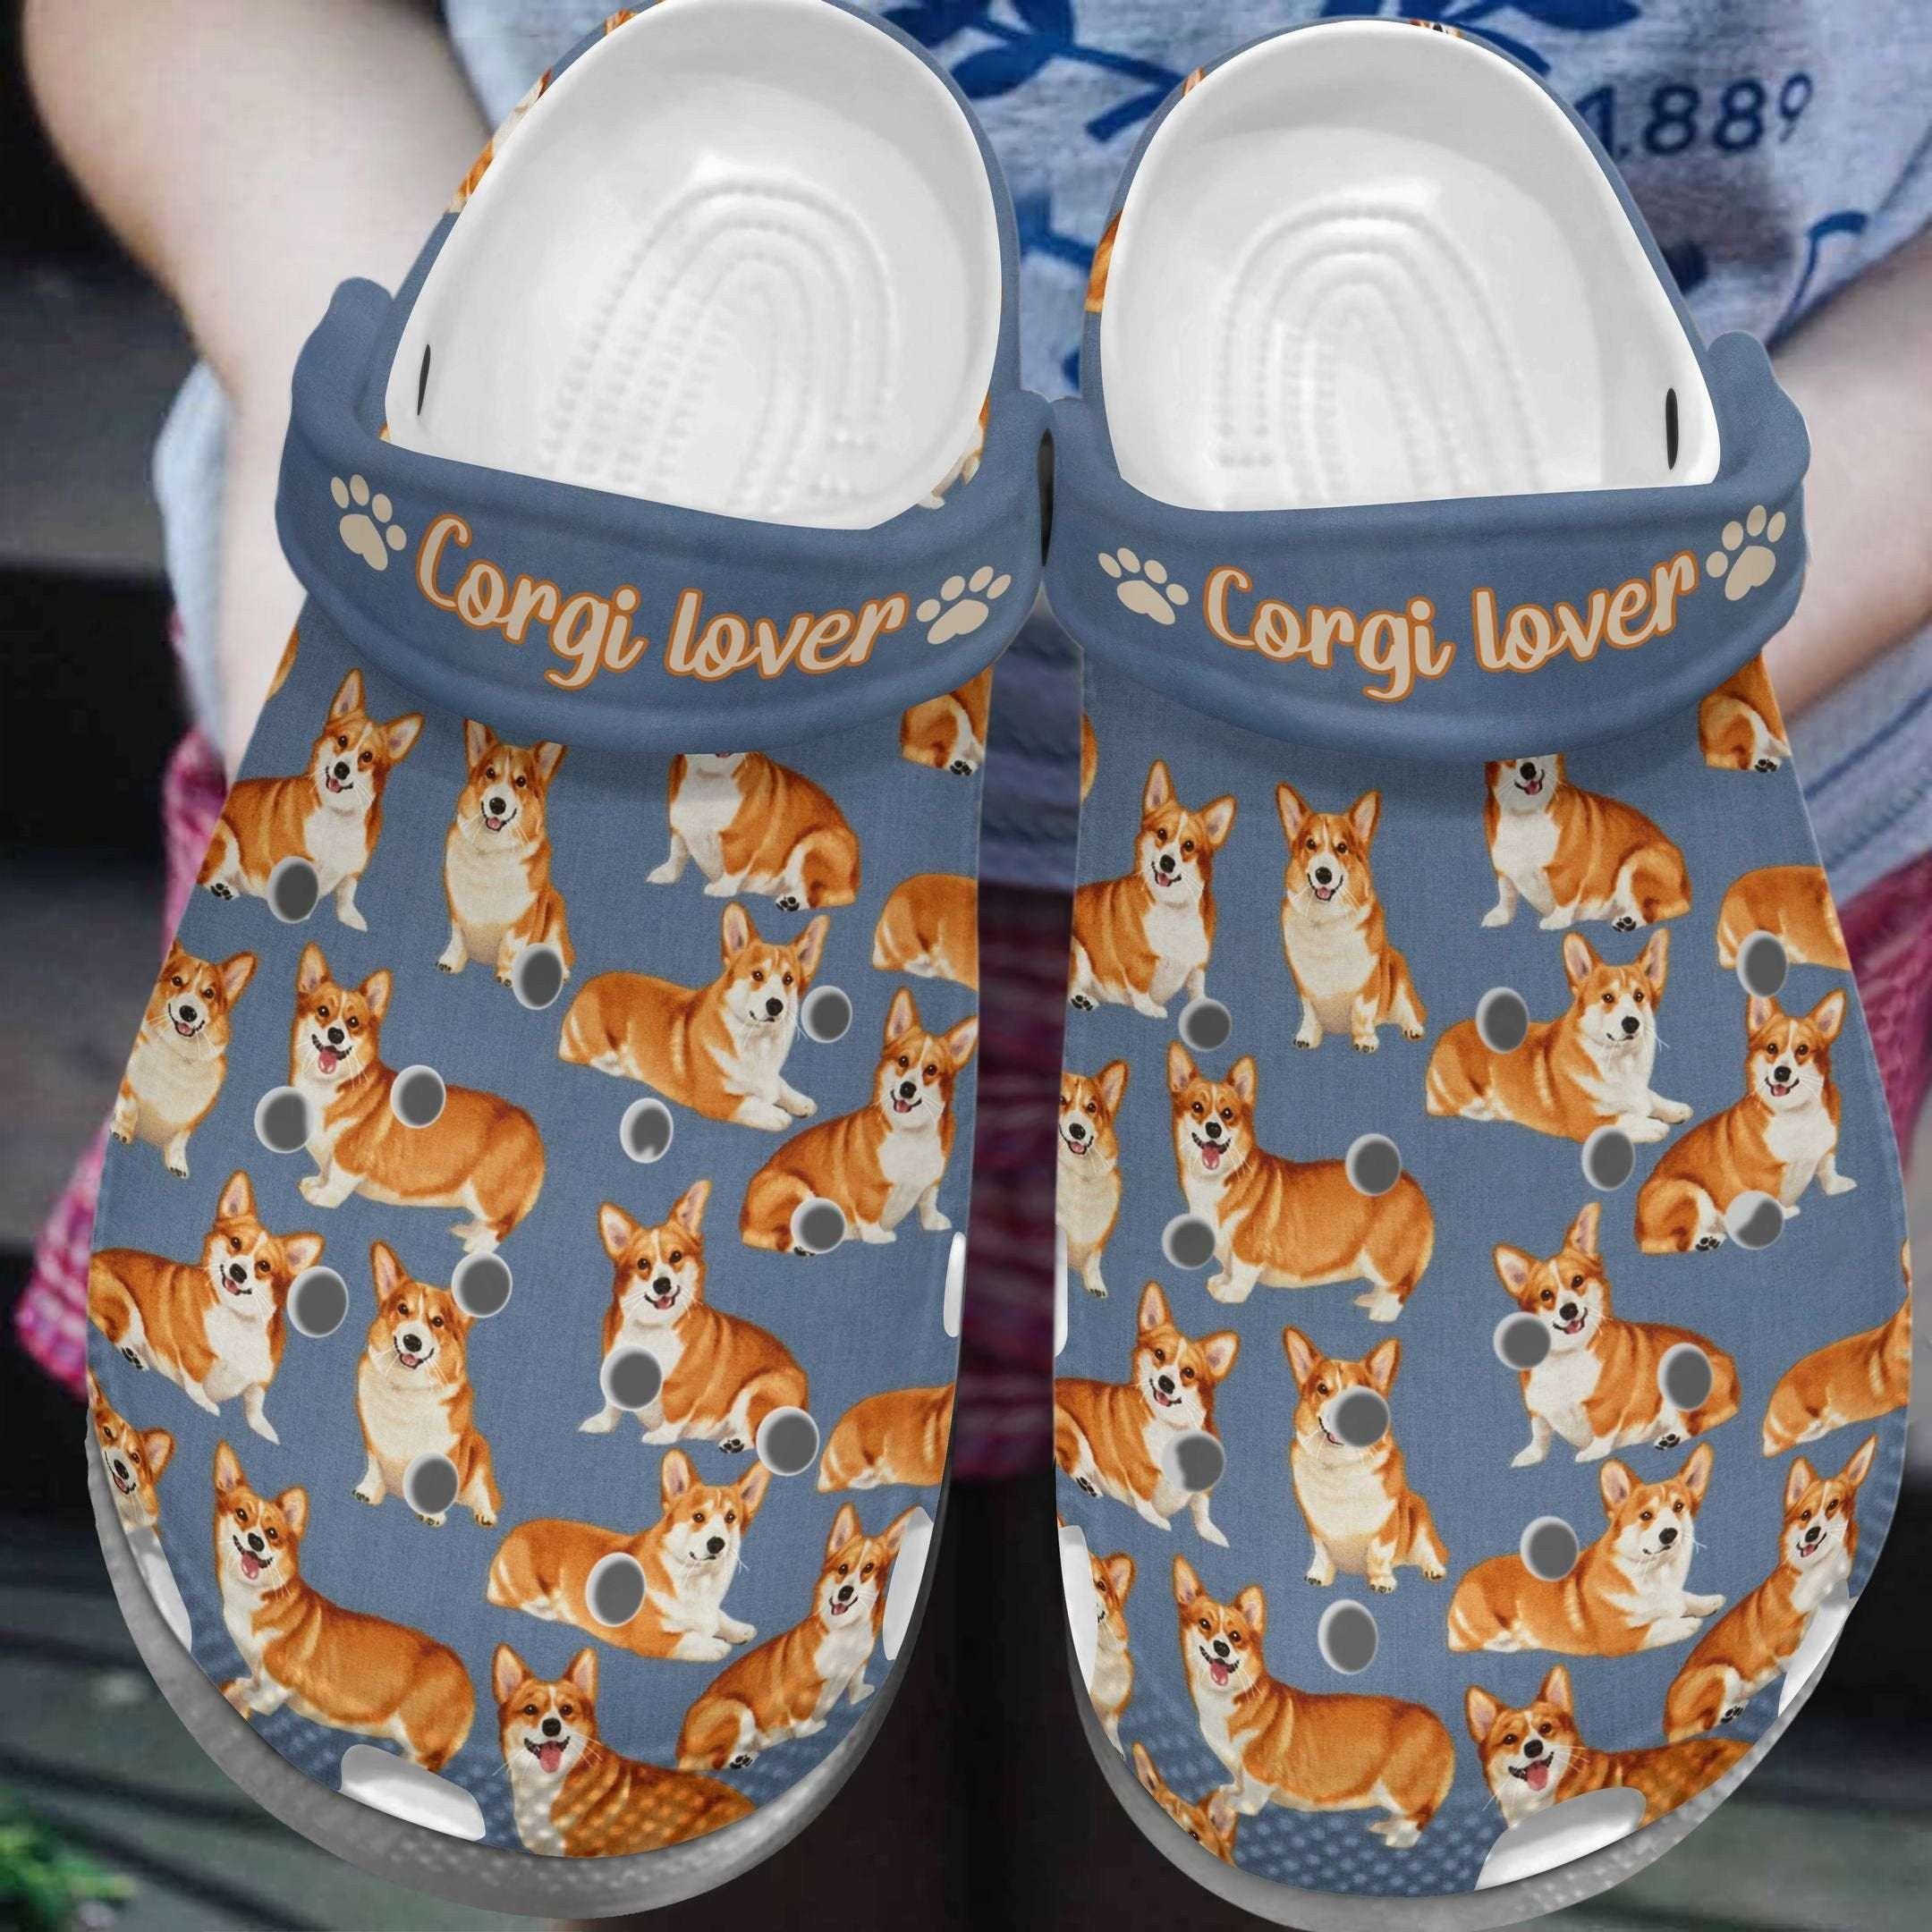 Corgi Lover Crocs Clog Shoes